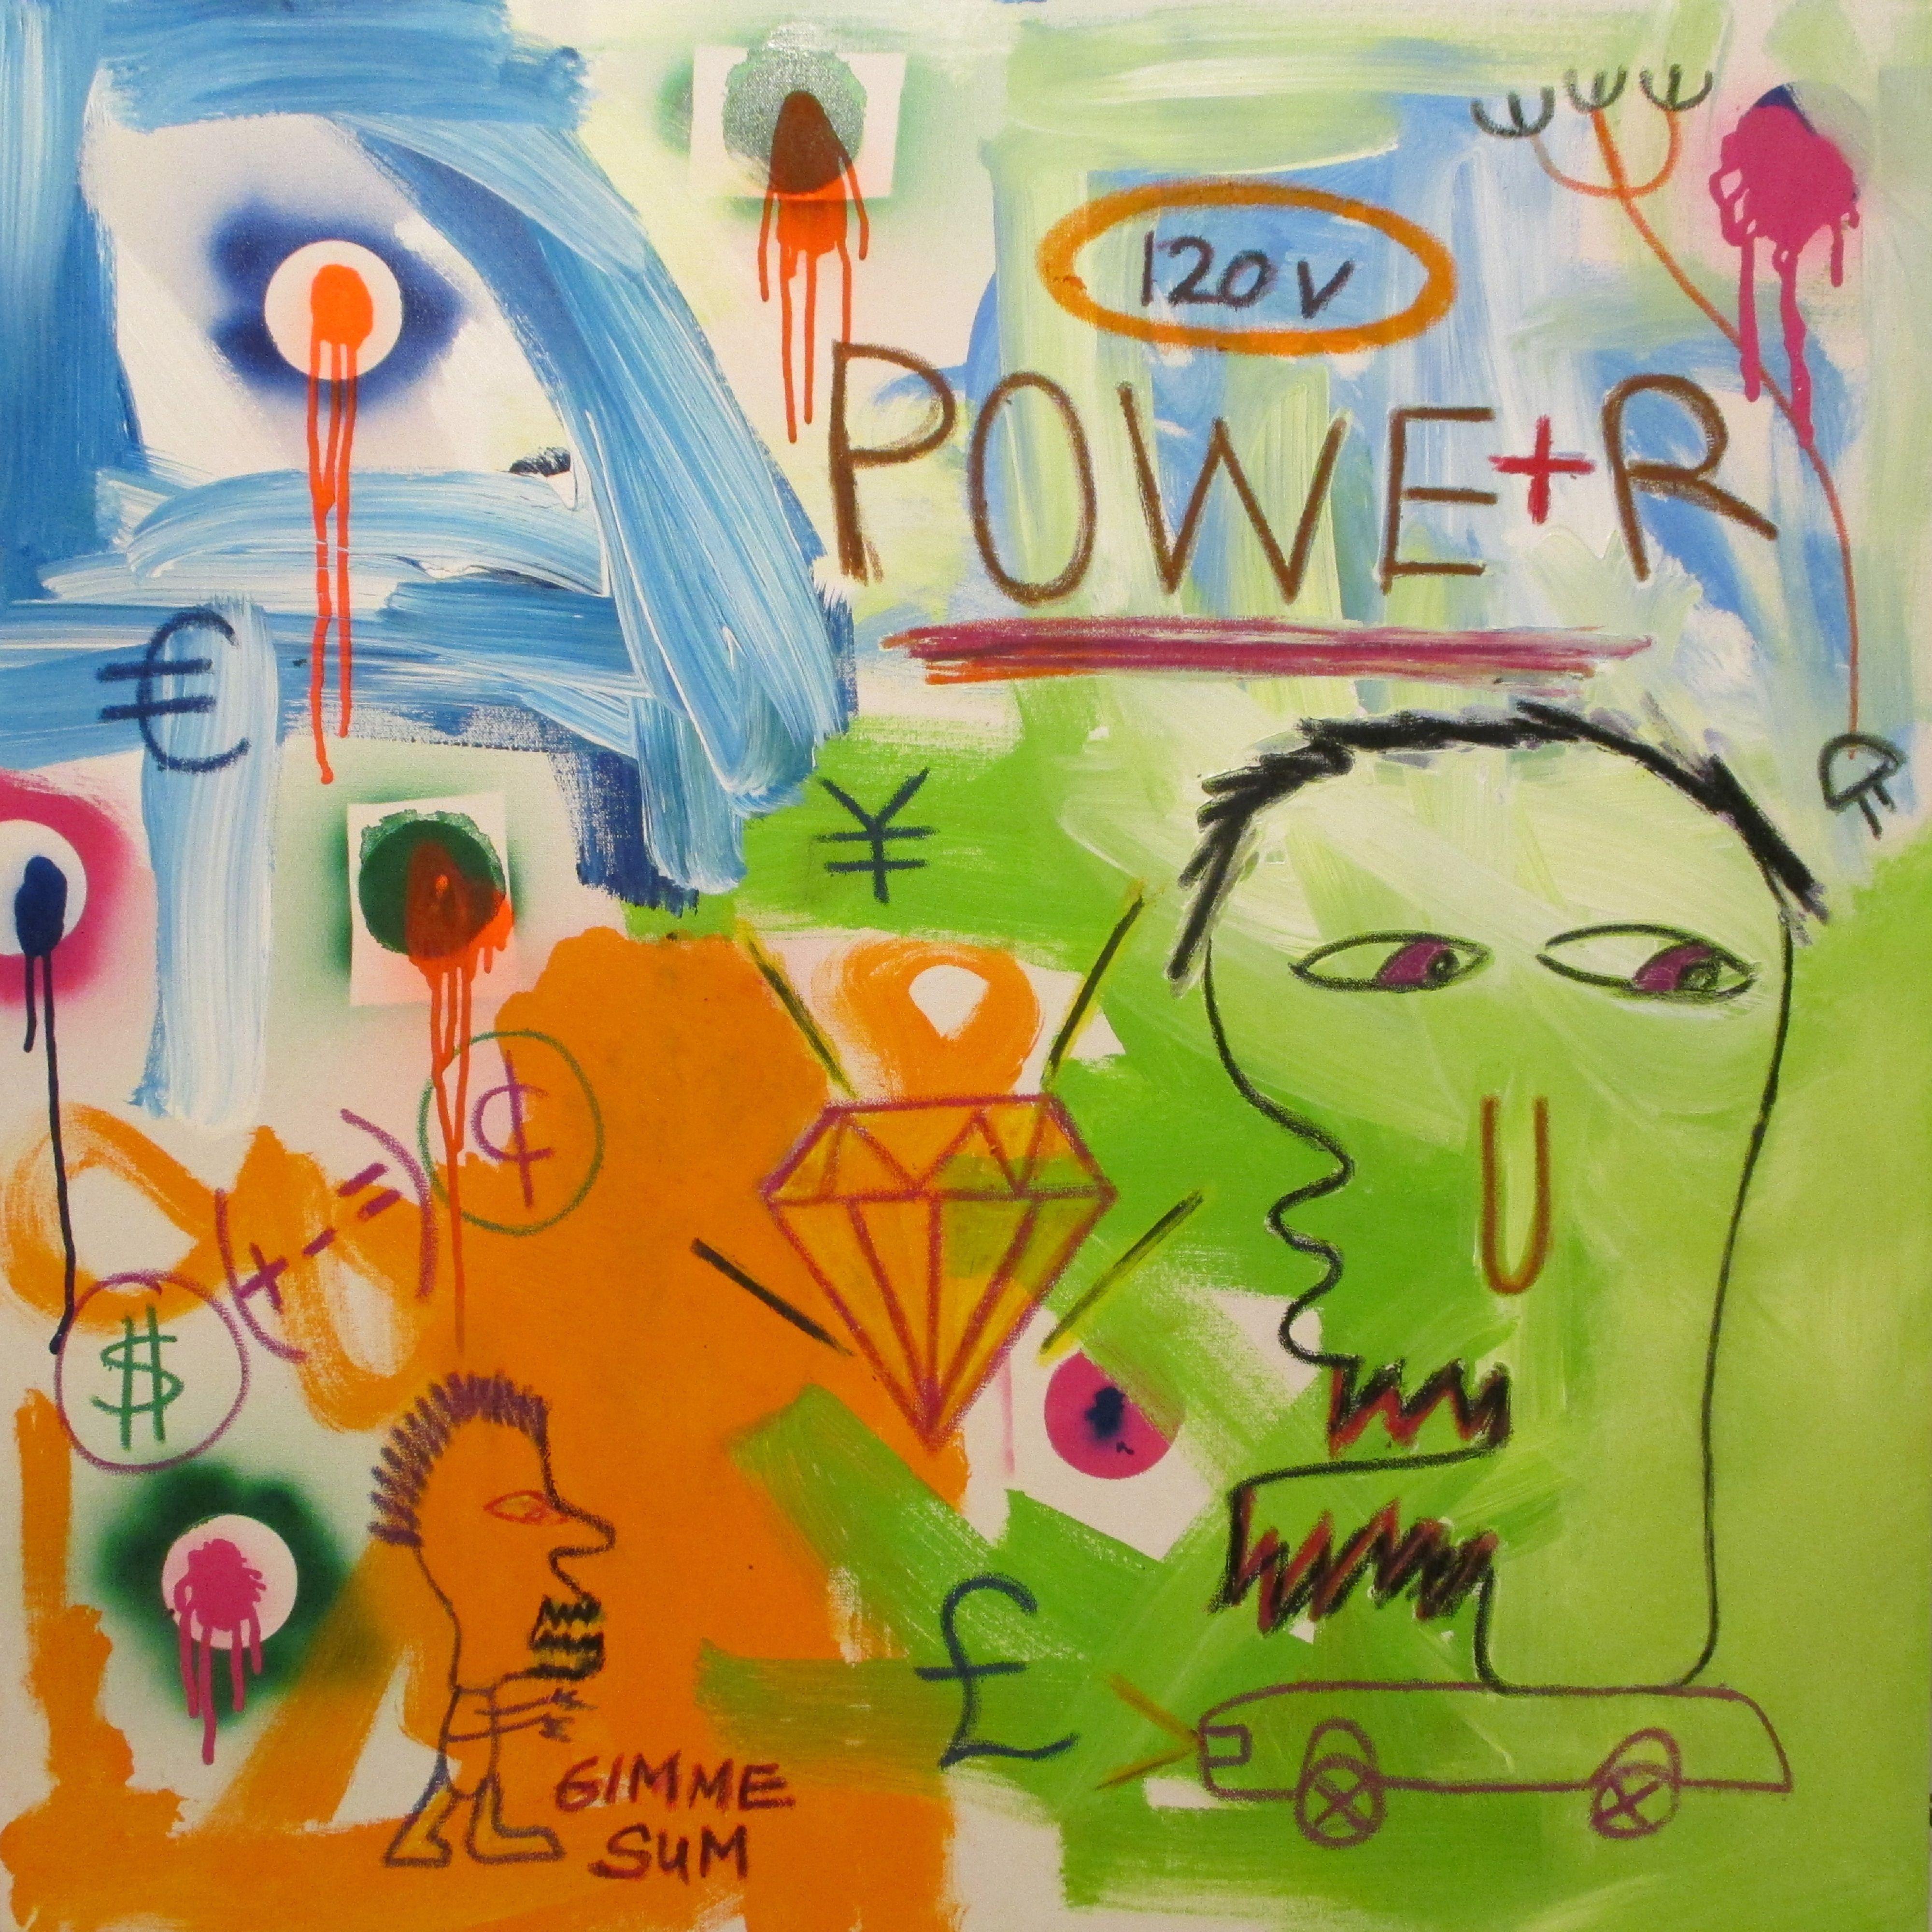 Power Gimme Sum Painting Art Pop Art Painting